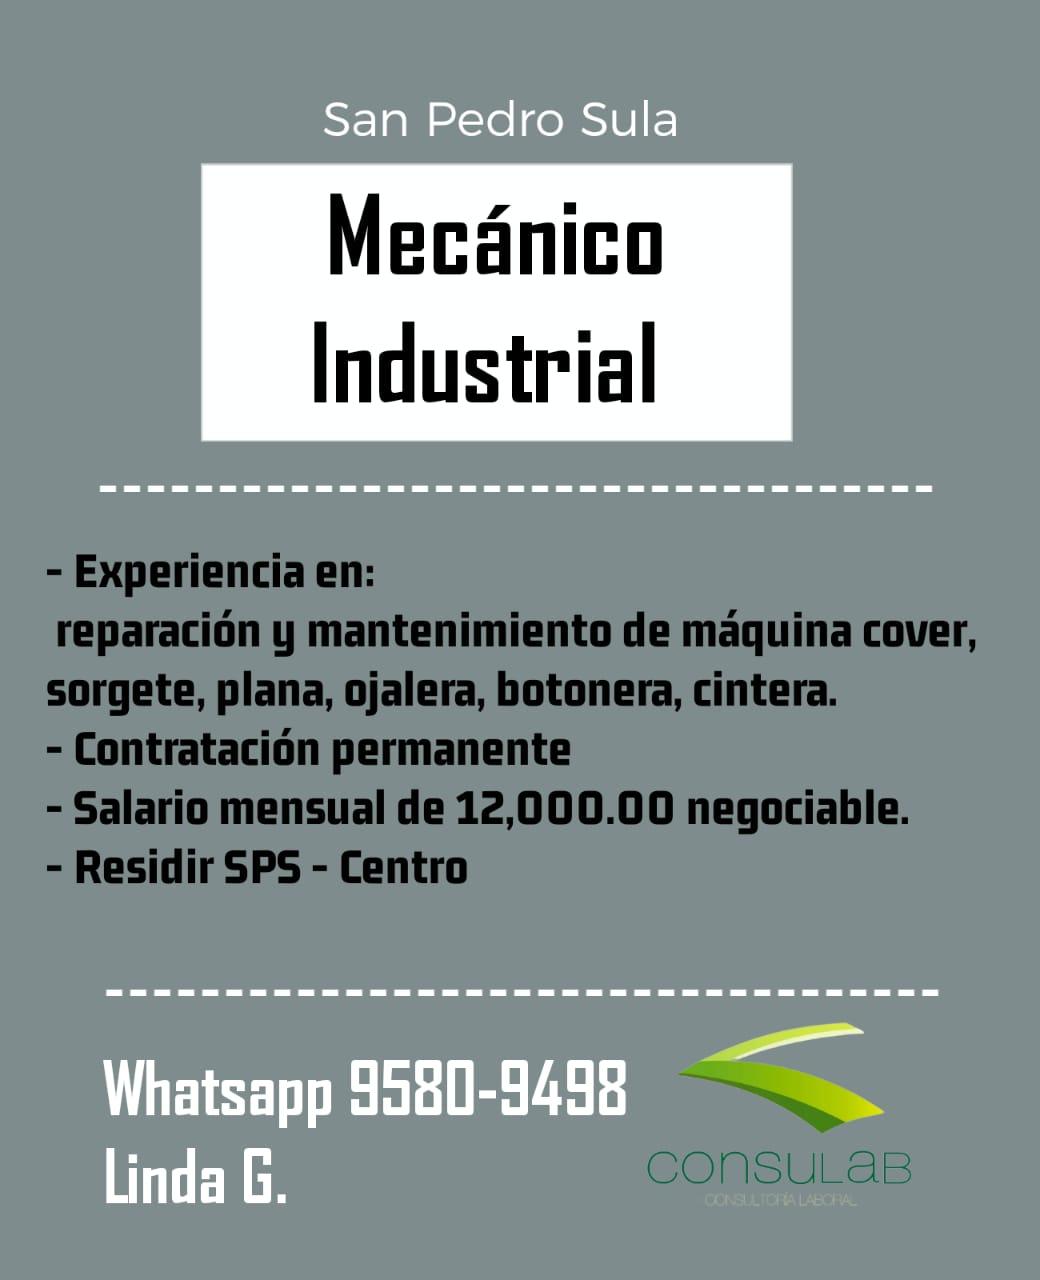 Mecánico Industrial en S.P.S.